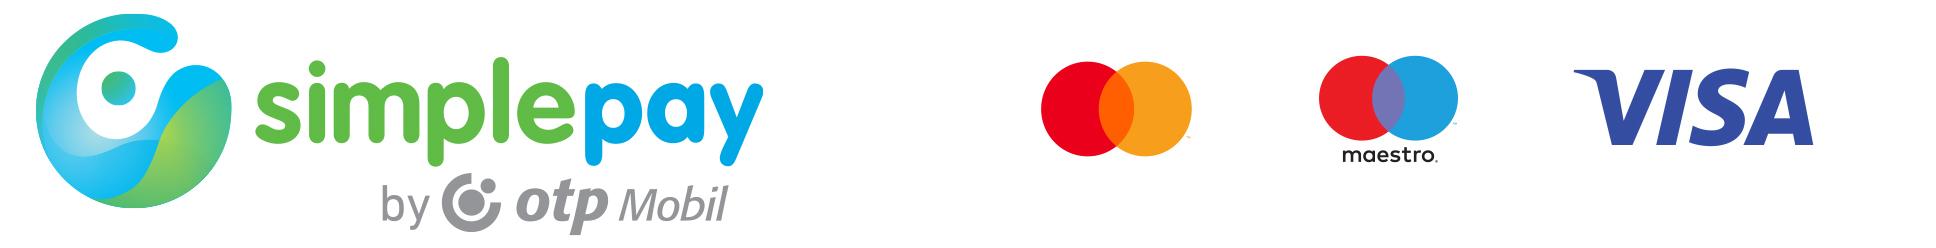 SimplePay bankkártya logók